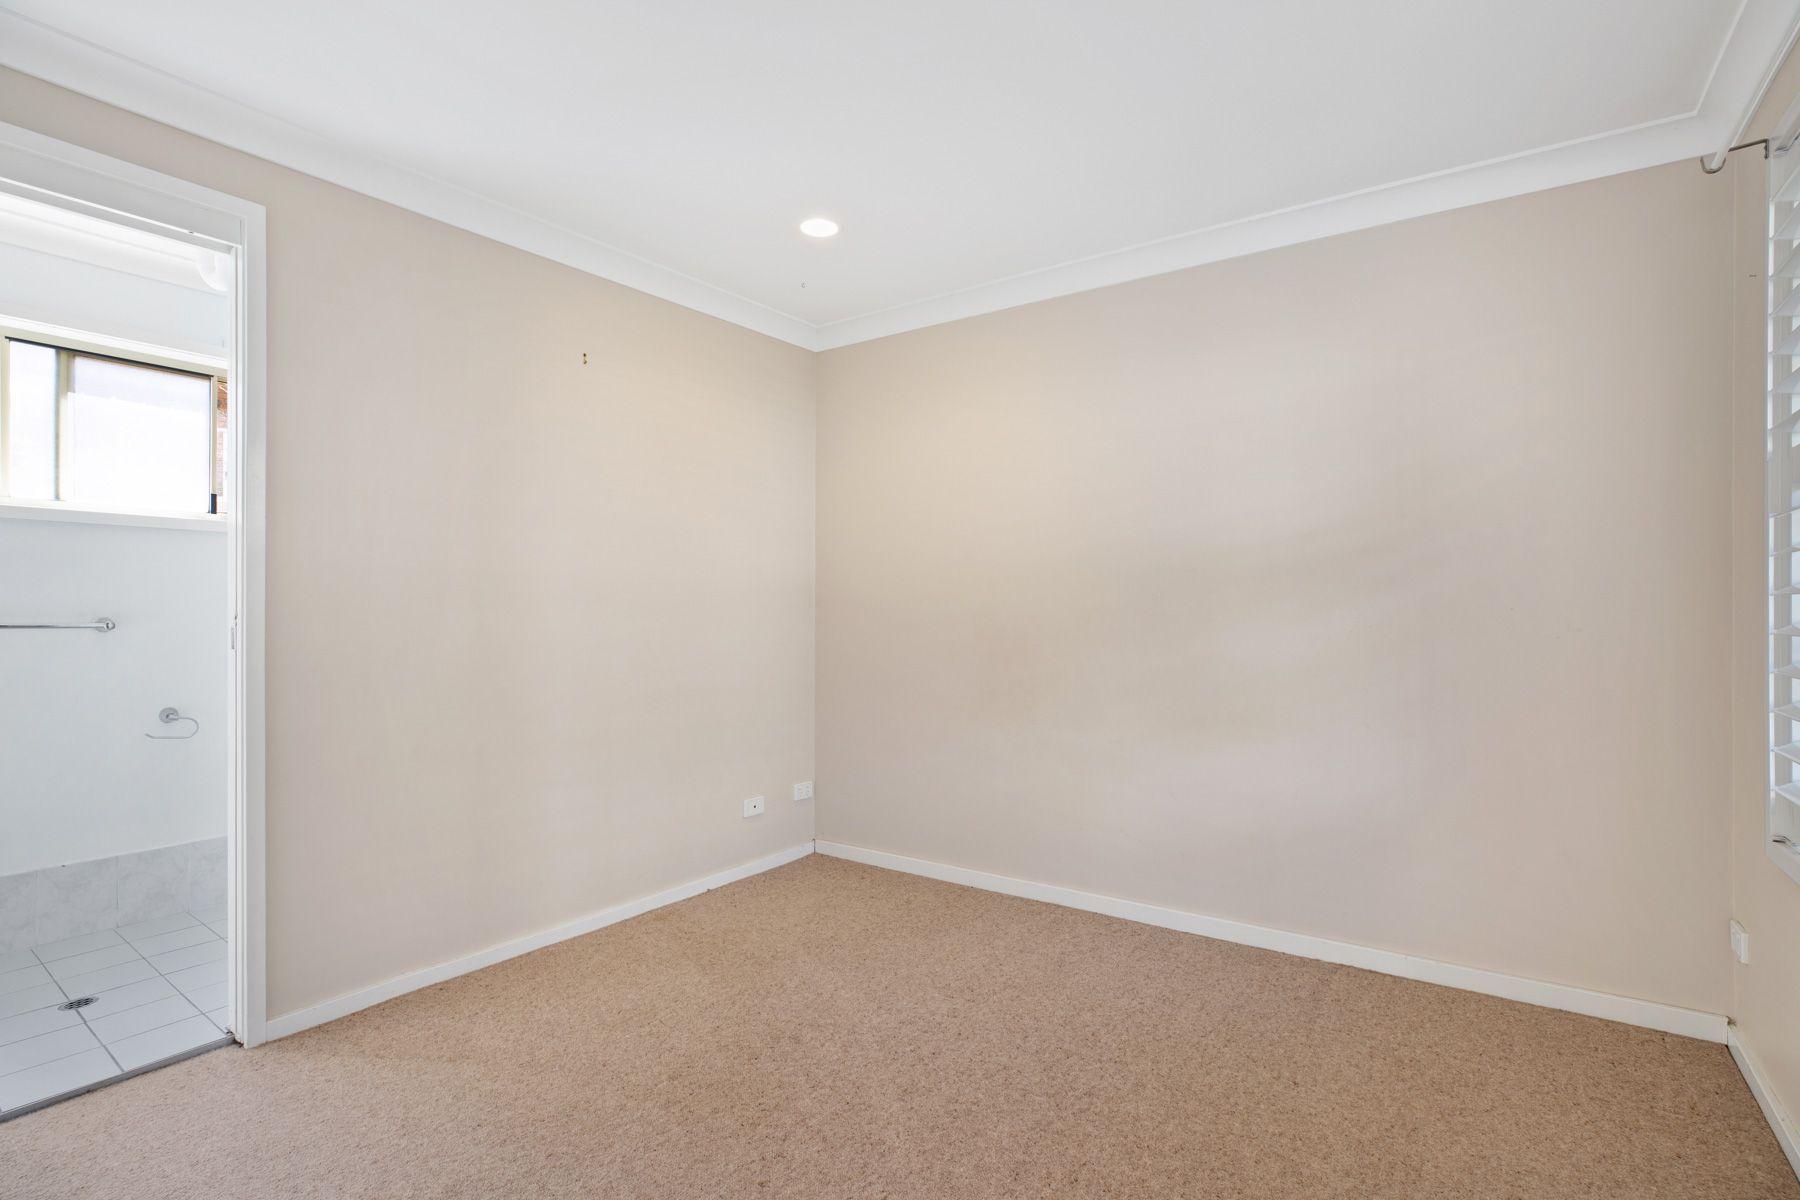 2/61 Dudley Road, Charlestown, NSW 2290